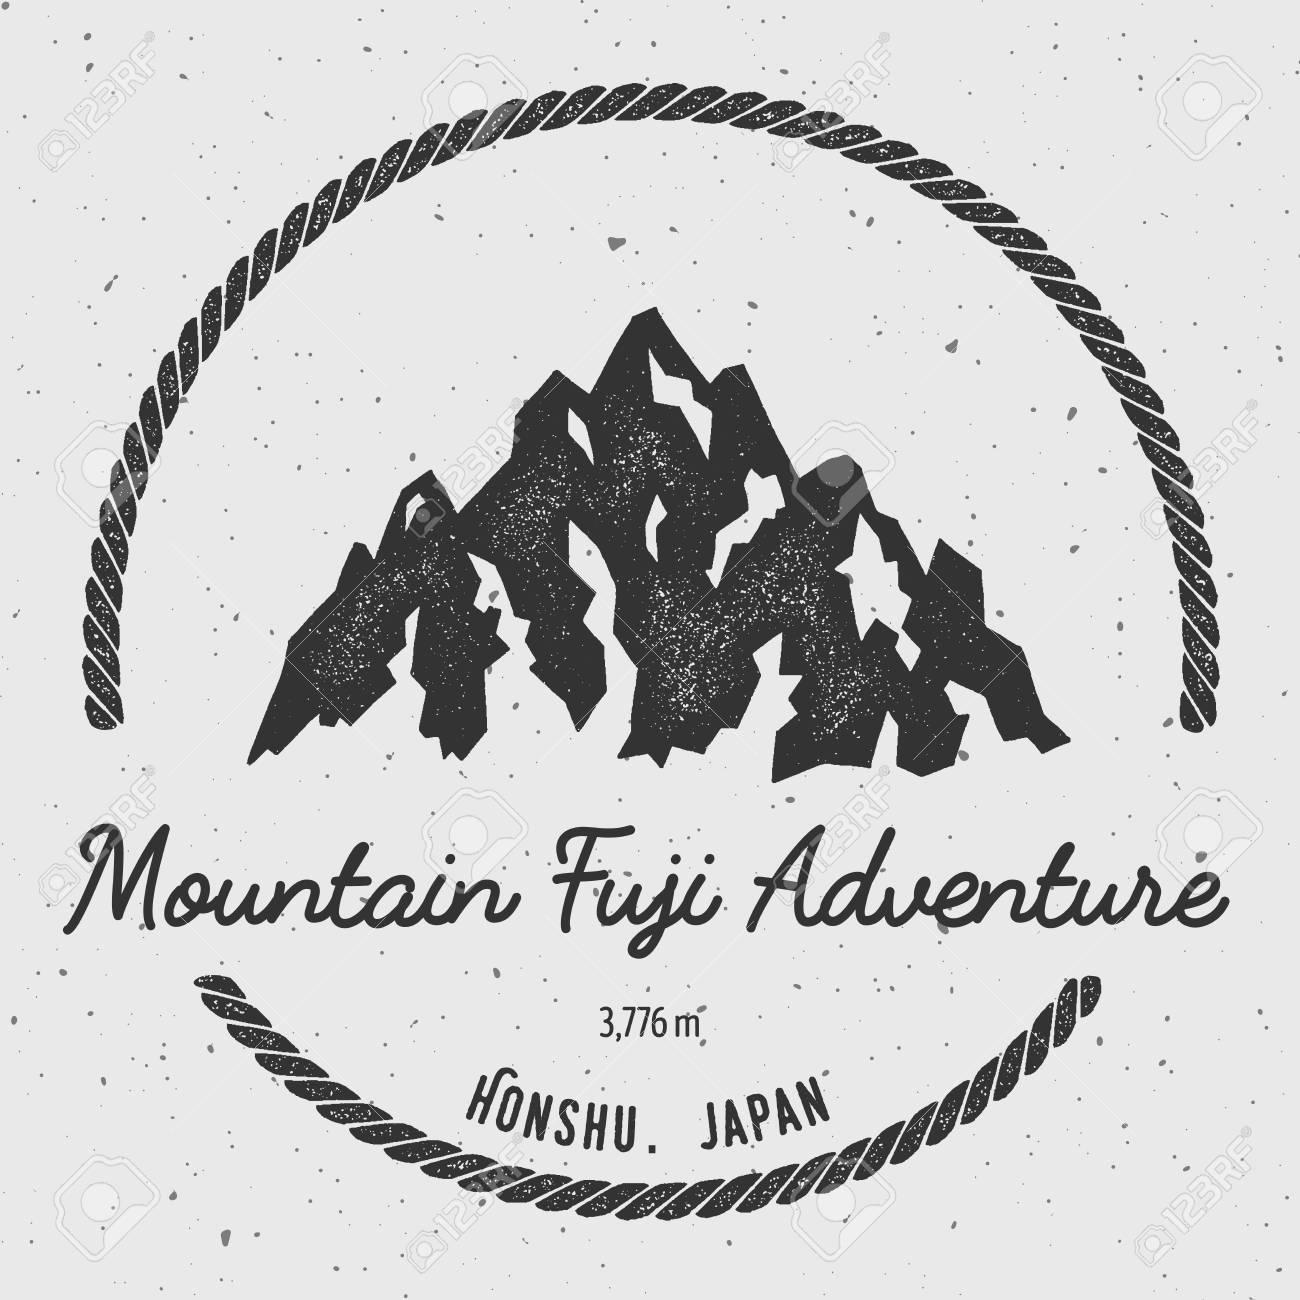 Fuji In Honshu Japan Outdoor Adventure Logo Round Hiking Vector Insignia Climbing